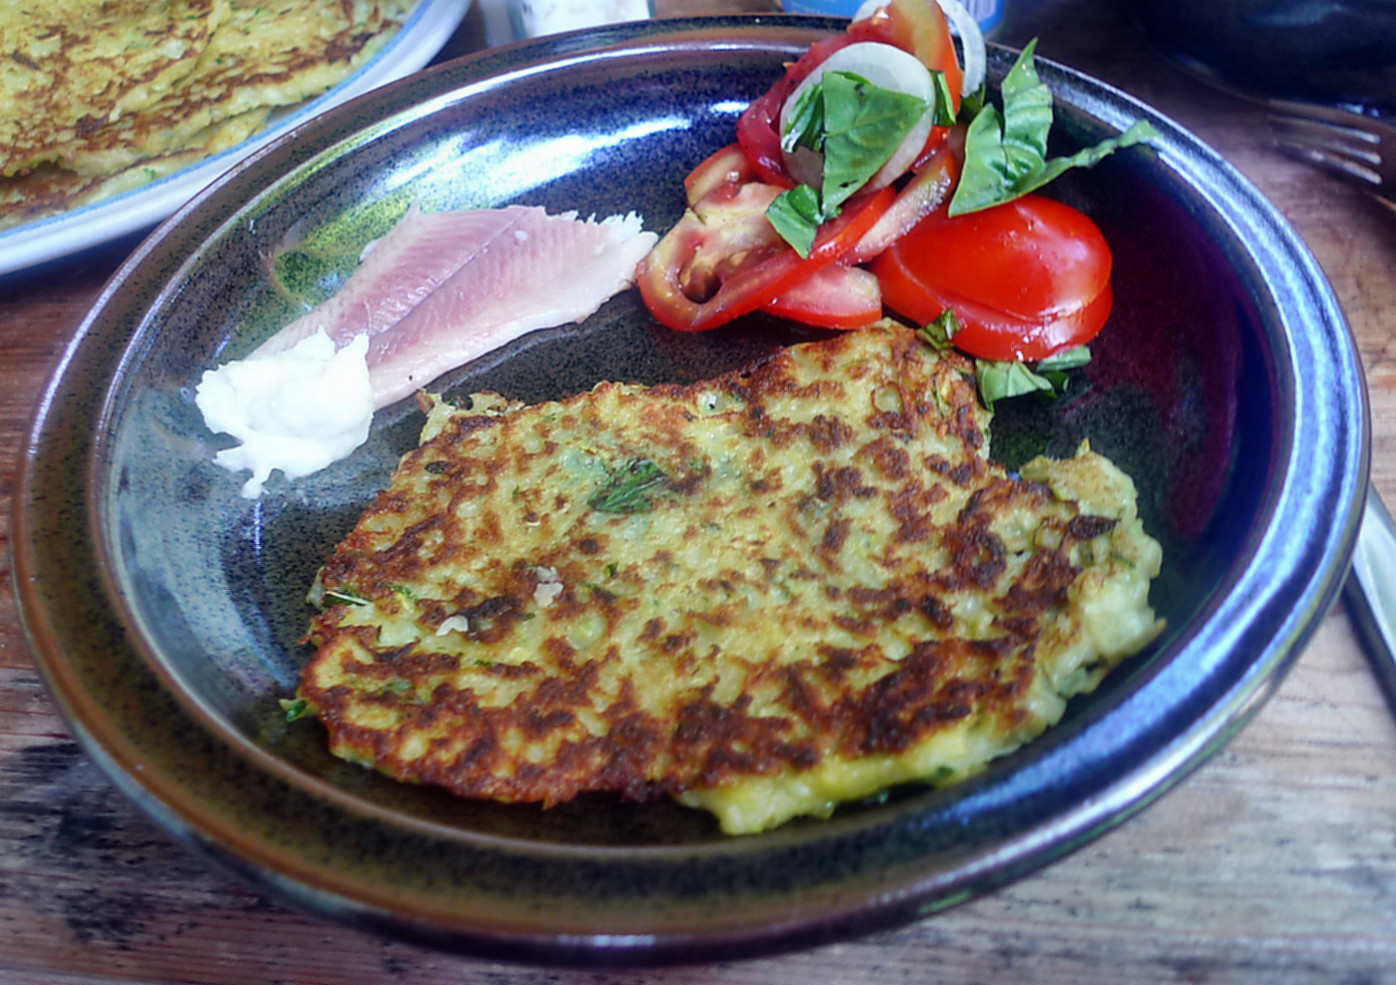 Zucchini-Kartoffelpuffer-26.7.14   (1)